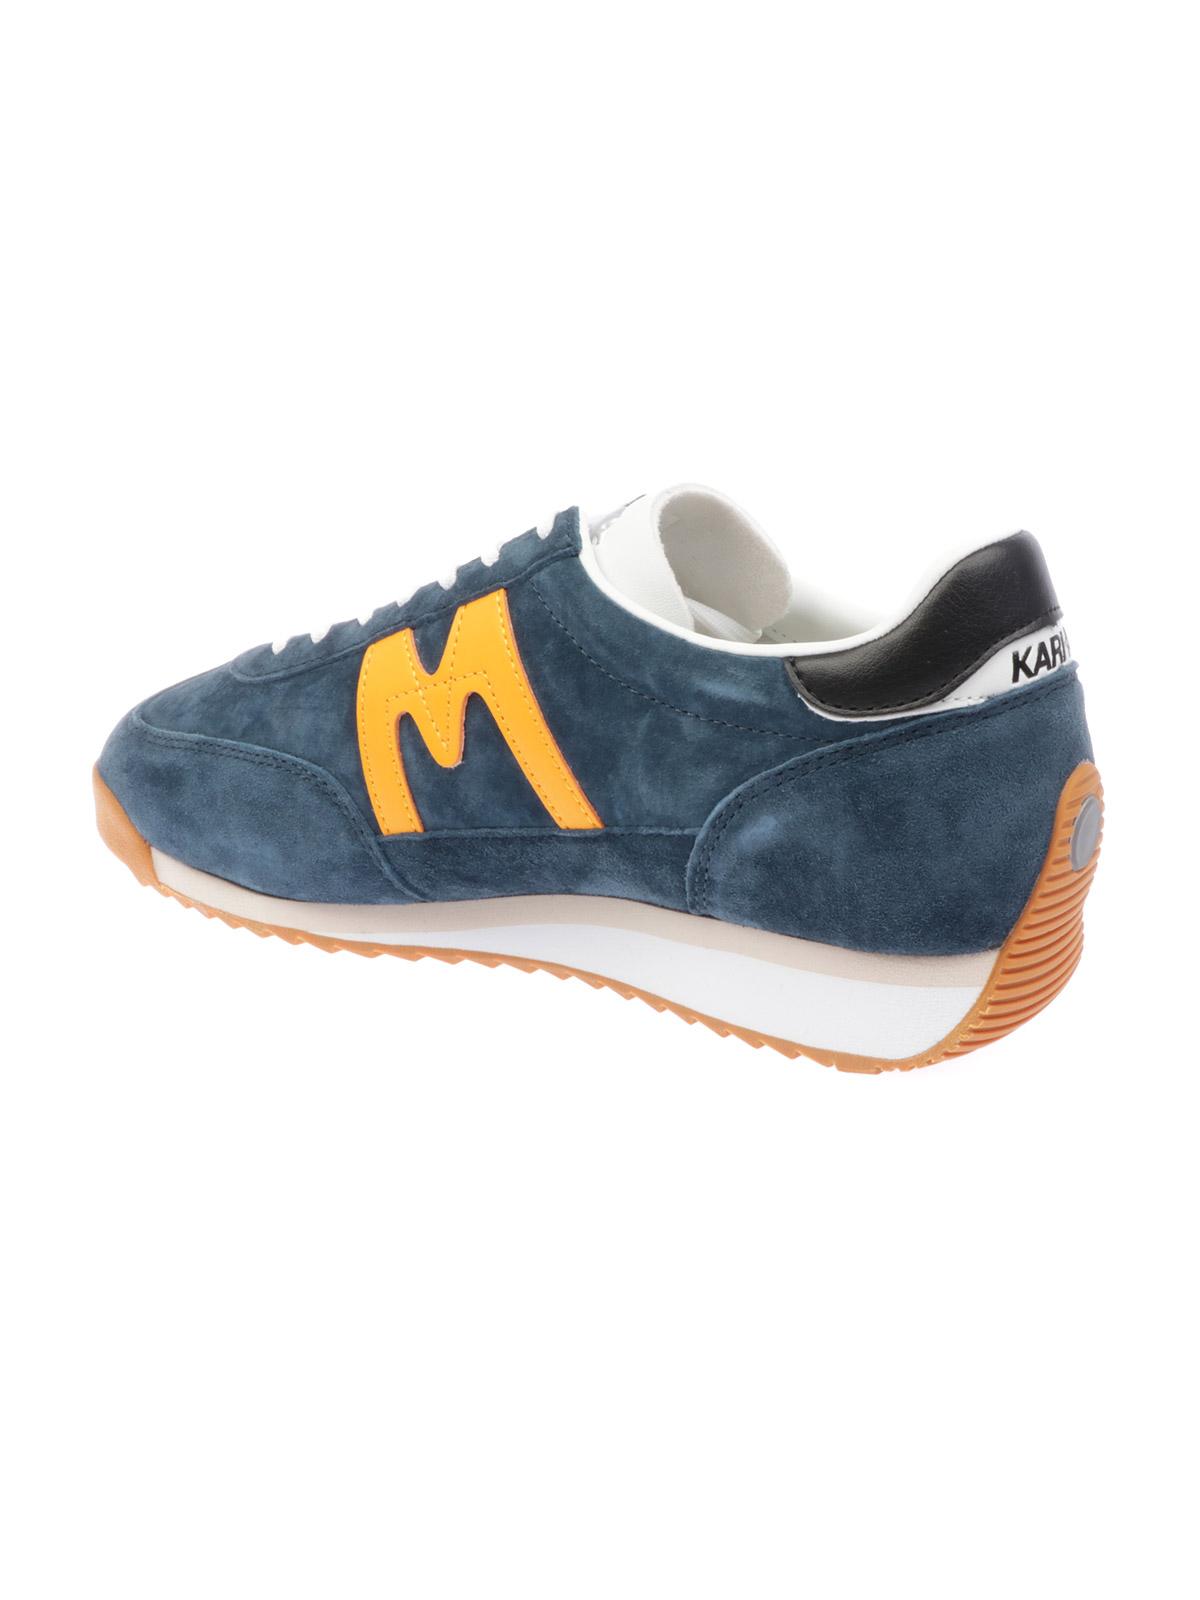 Picture of KARHU | Men's Championair Sneaker